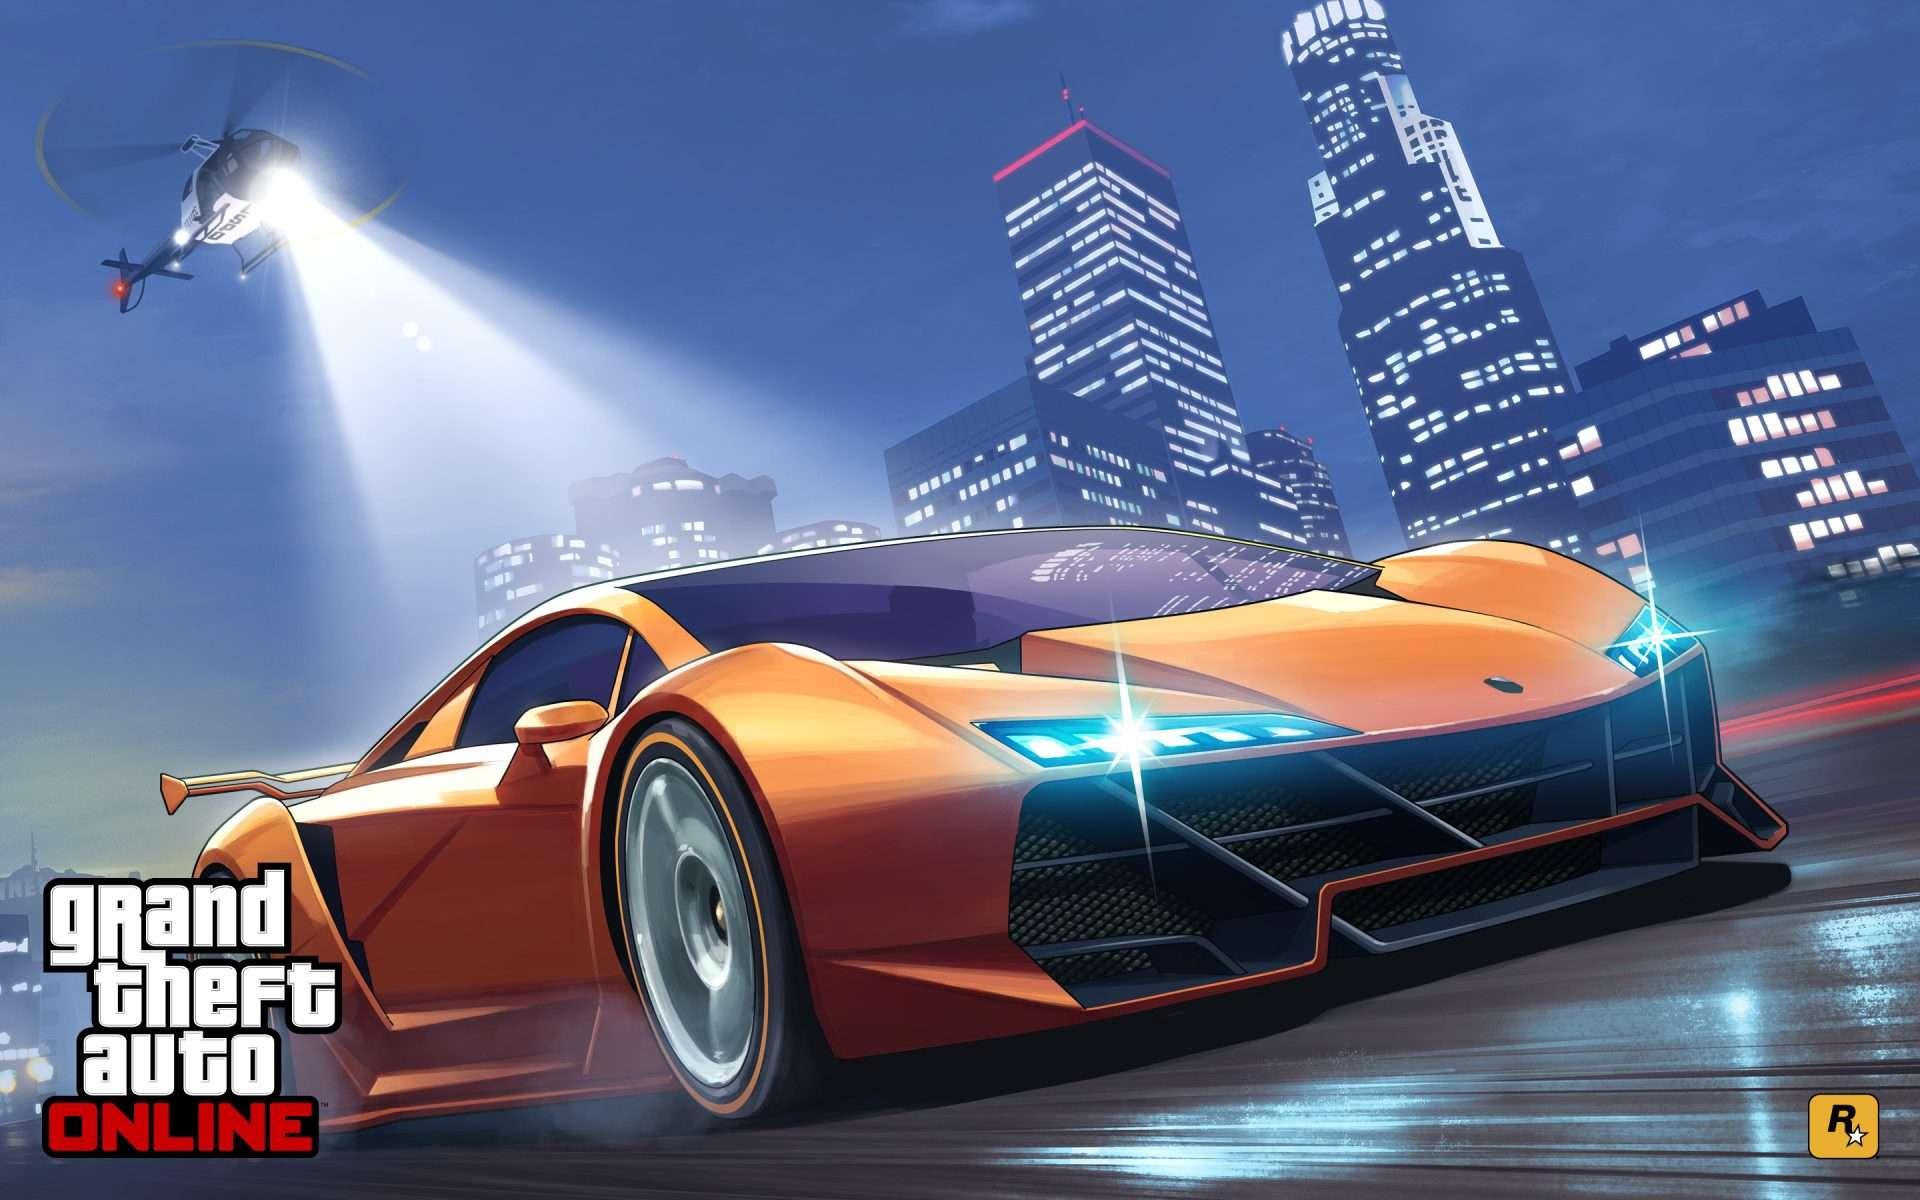 Game Grand Theft Auto V Wallpaper 046